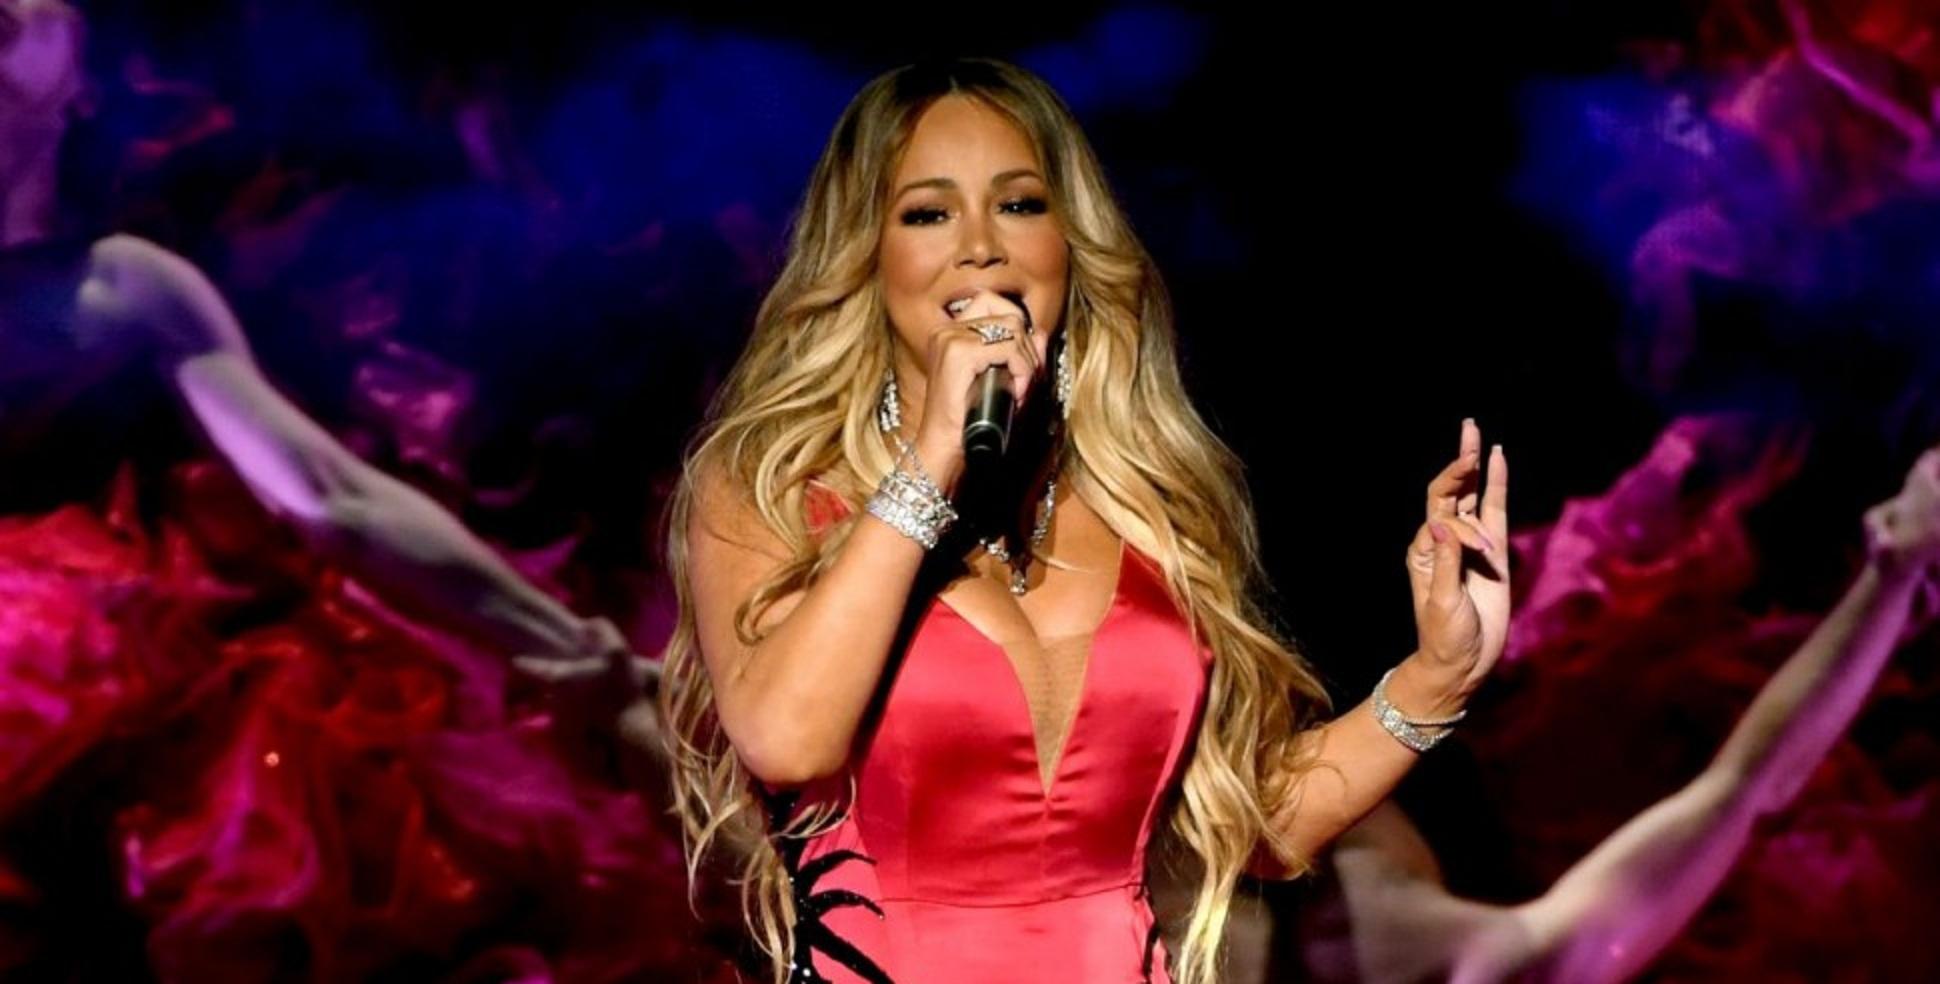 Poll: Which Song Should Mariah Carey Perform at Billboard Awards This Year?